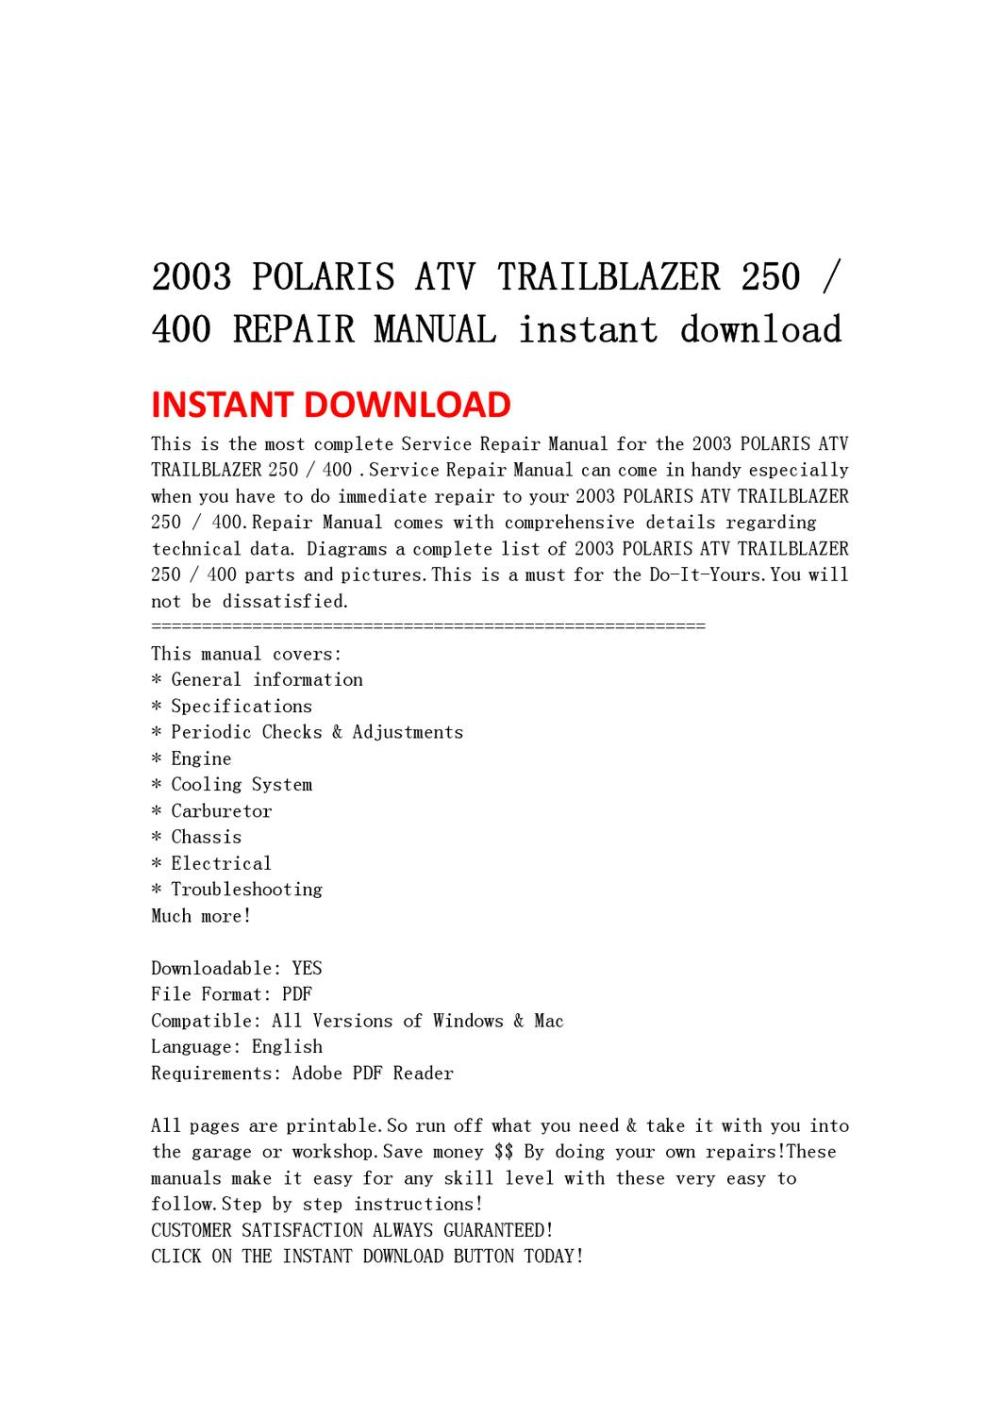 medium resolution of 2003 polaris atv trailblazer 250 400 repair manual instant download by yu jiew issuu